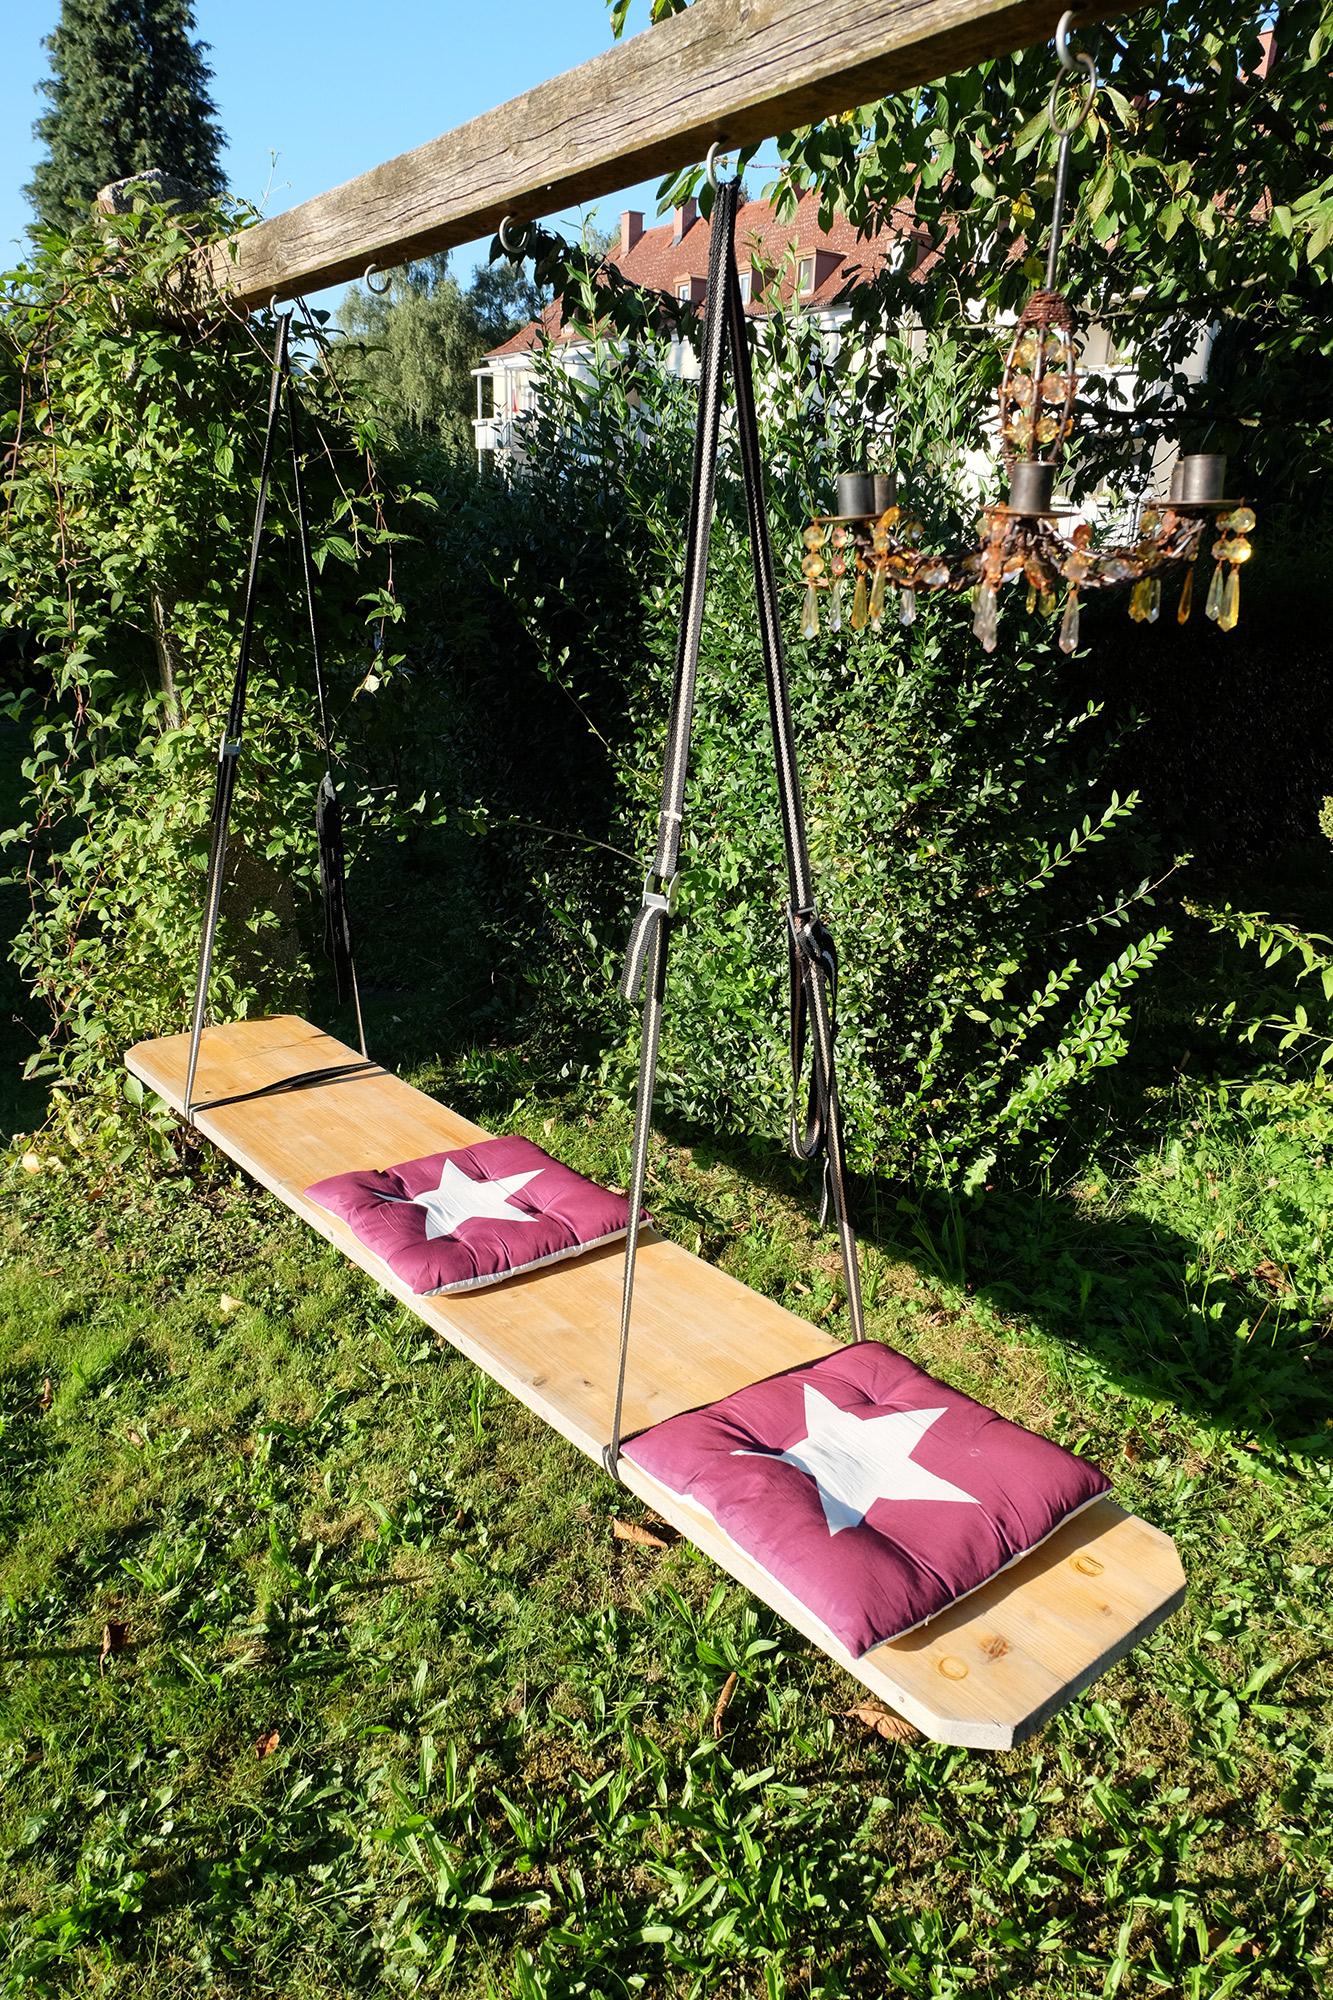 bolly-wood-swing-modern-design-chair-bench-furniture-board-contemporary-art-arts-fineart-gallery-museum-manfred-kili-kielnhofer-designer-7966